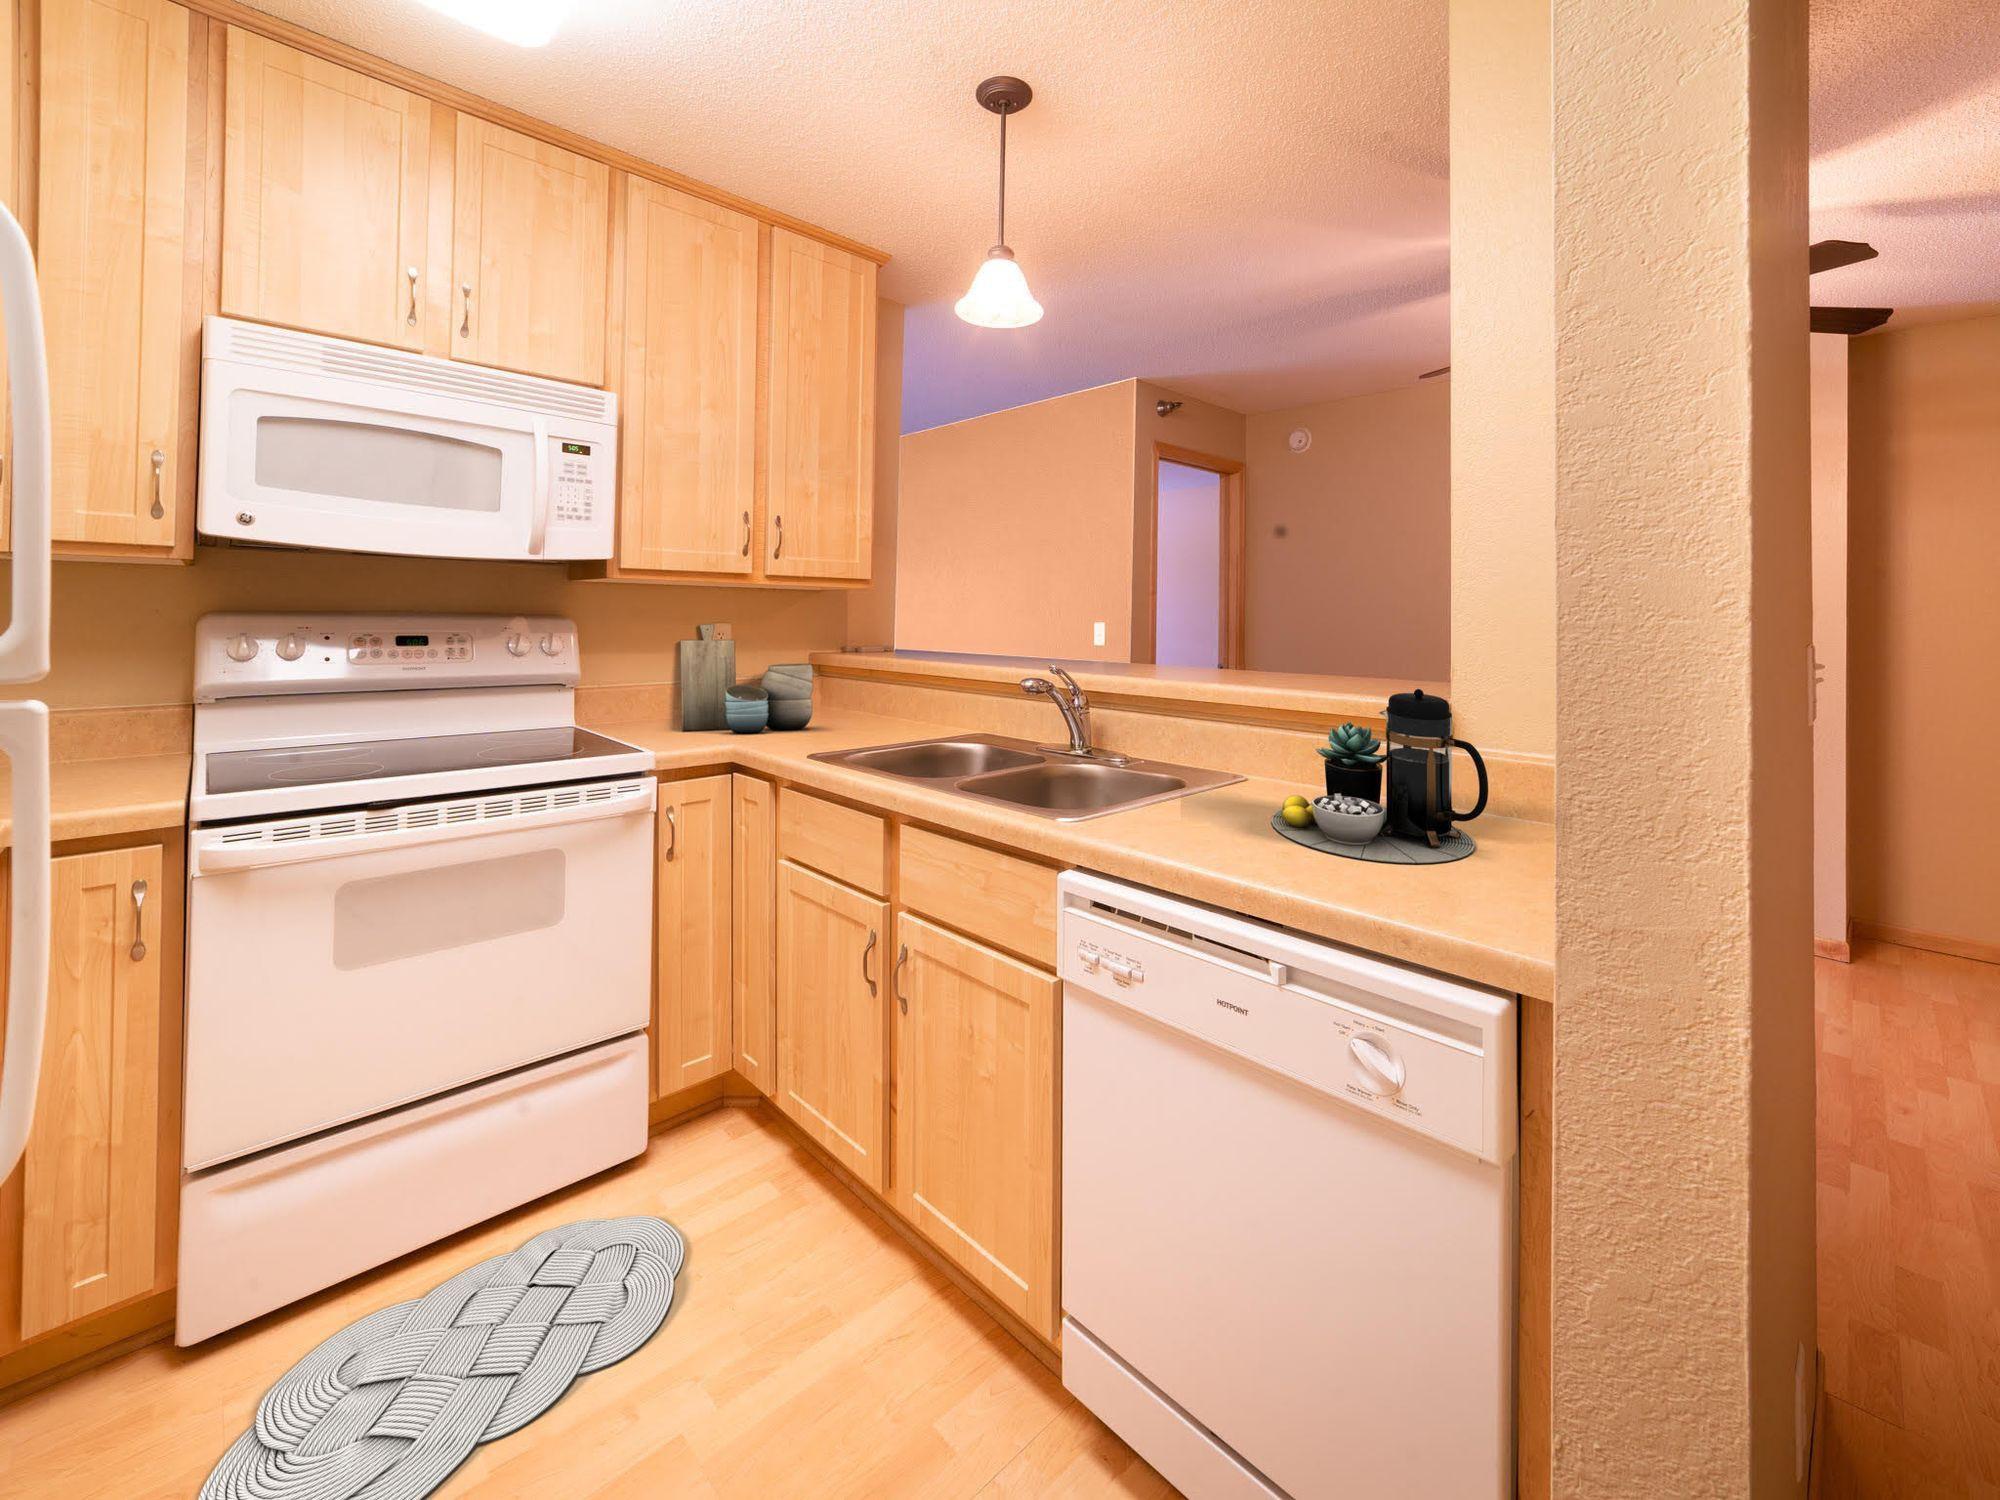 Apartments Near Metro State Maple Ridge Apartment Homes for Metropolitan State University Students in Saint Paul, MN